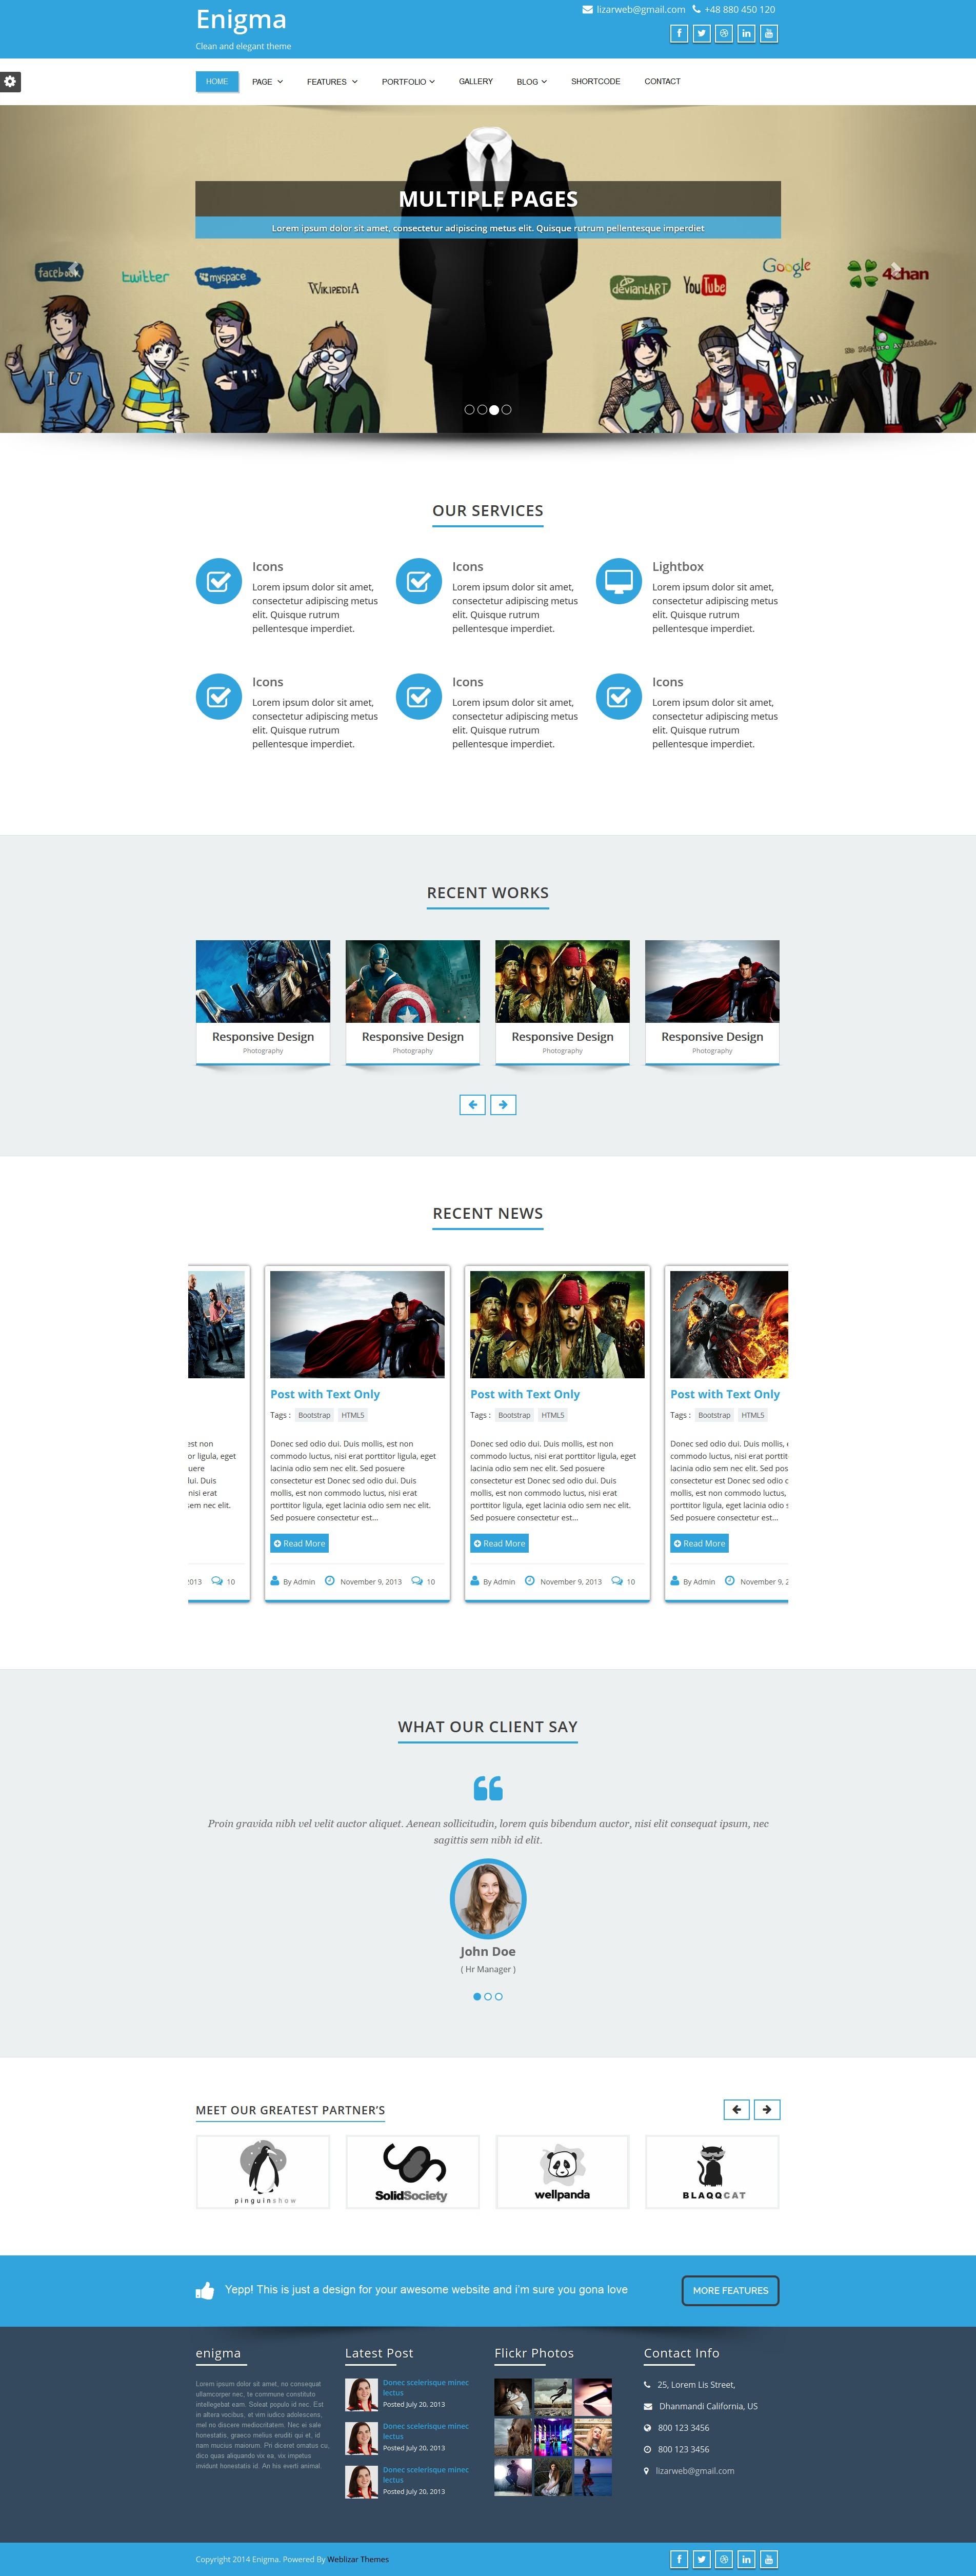 Enigma-Pro company WordPress theme